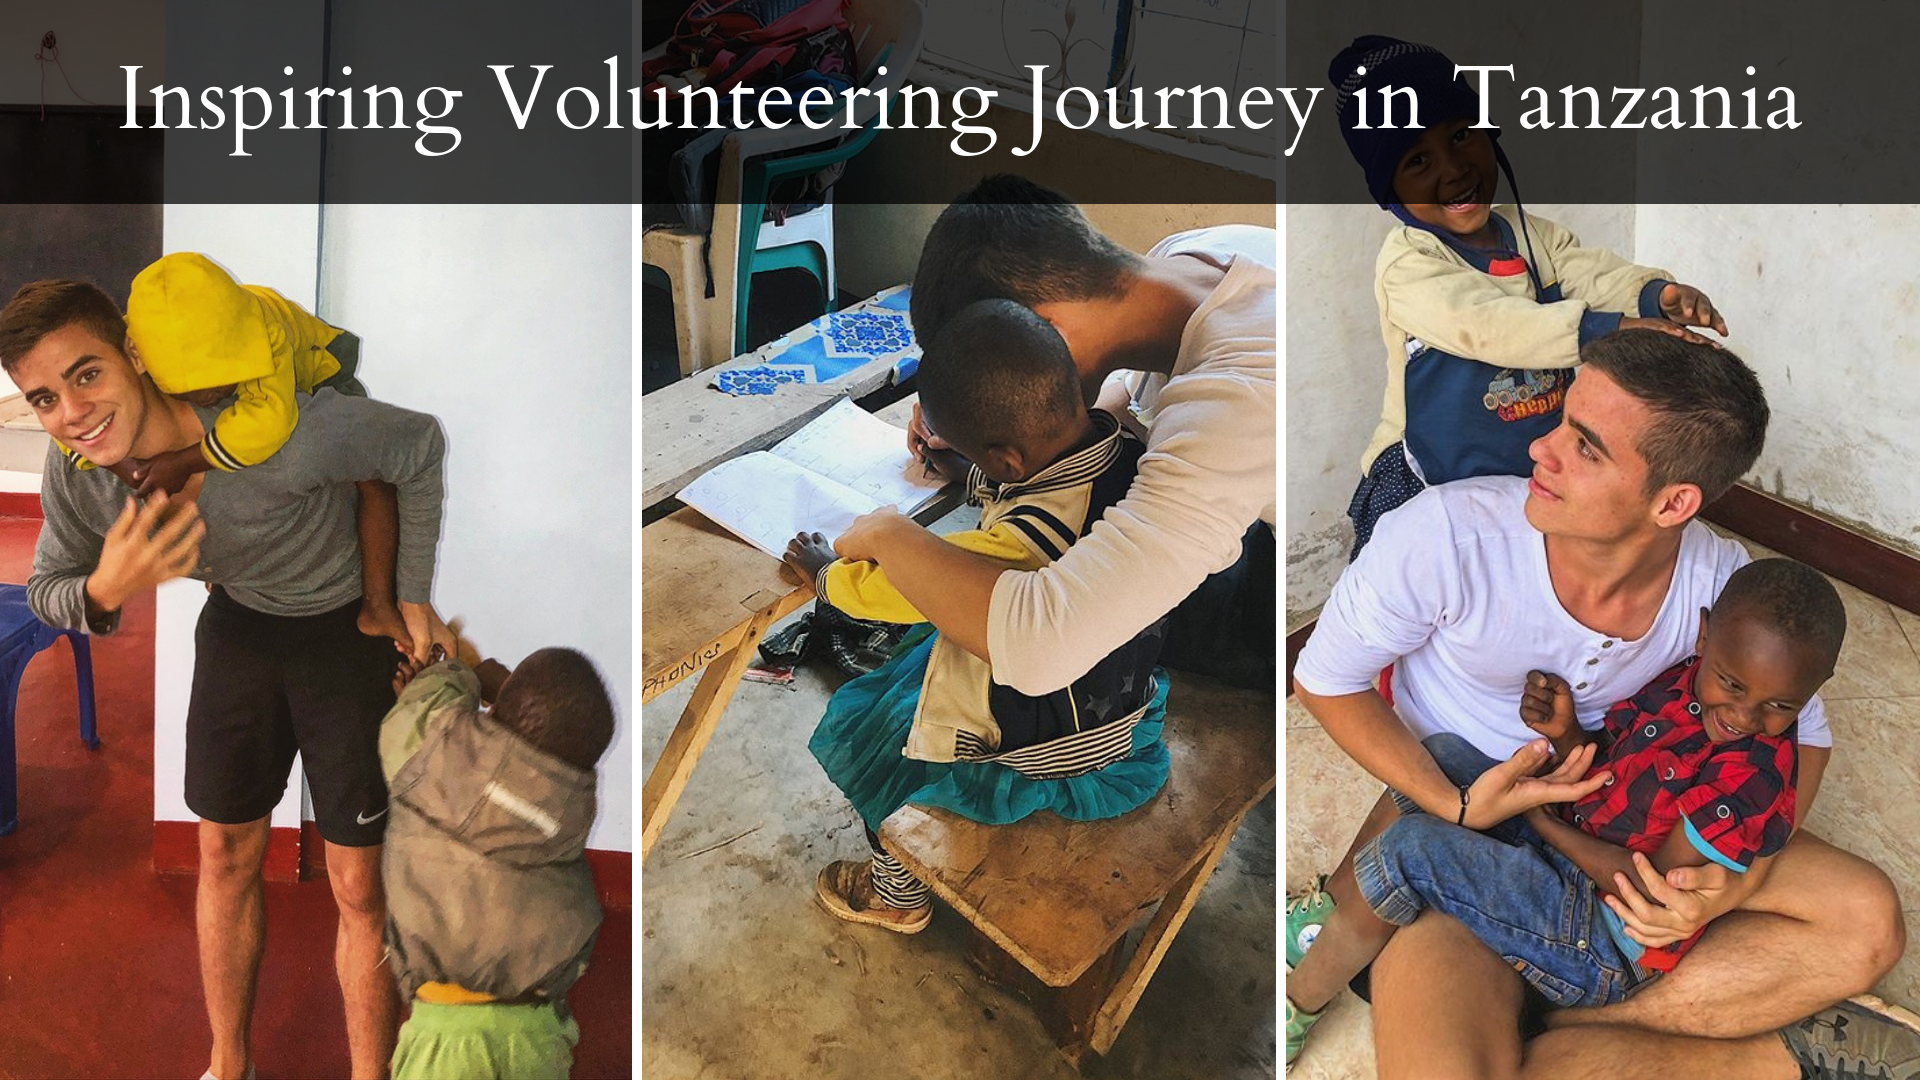 volunteering journey in Tanzania